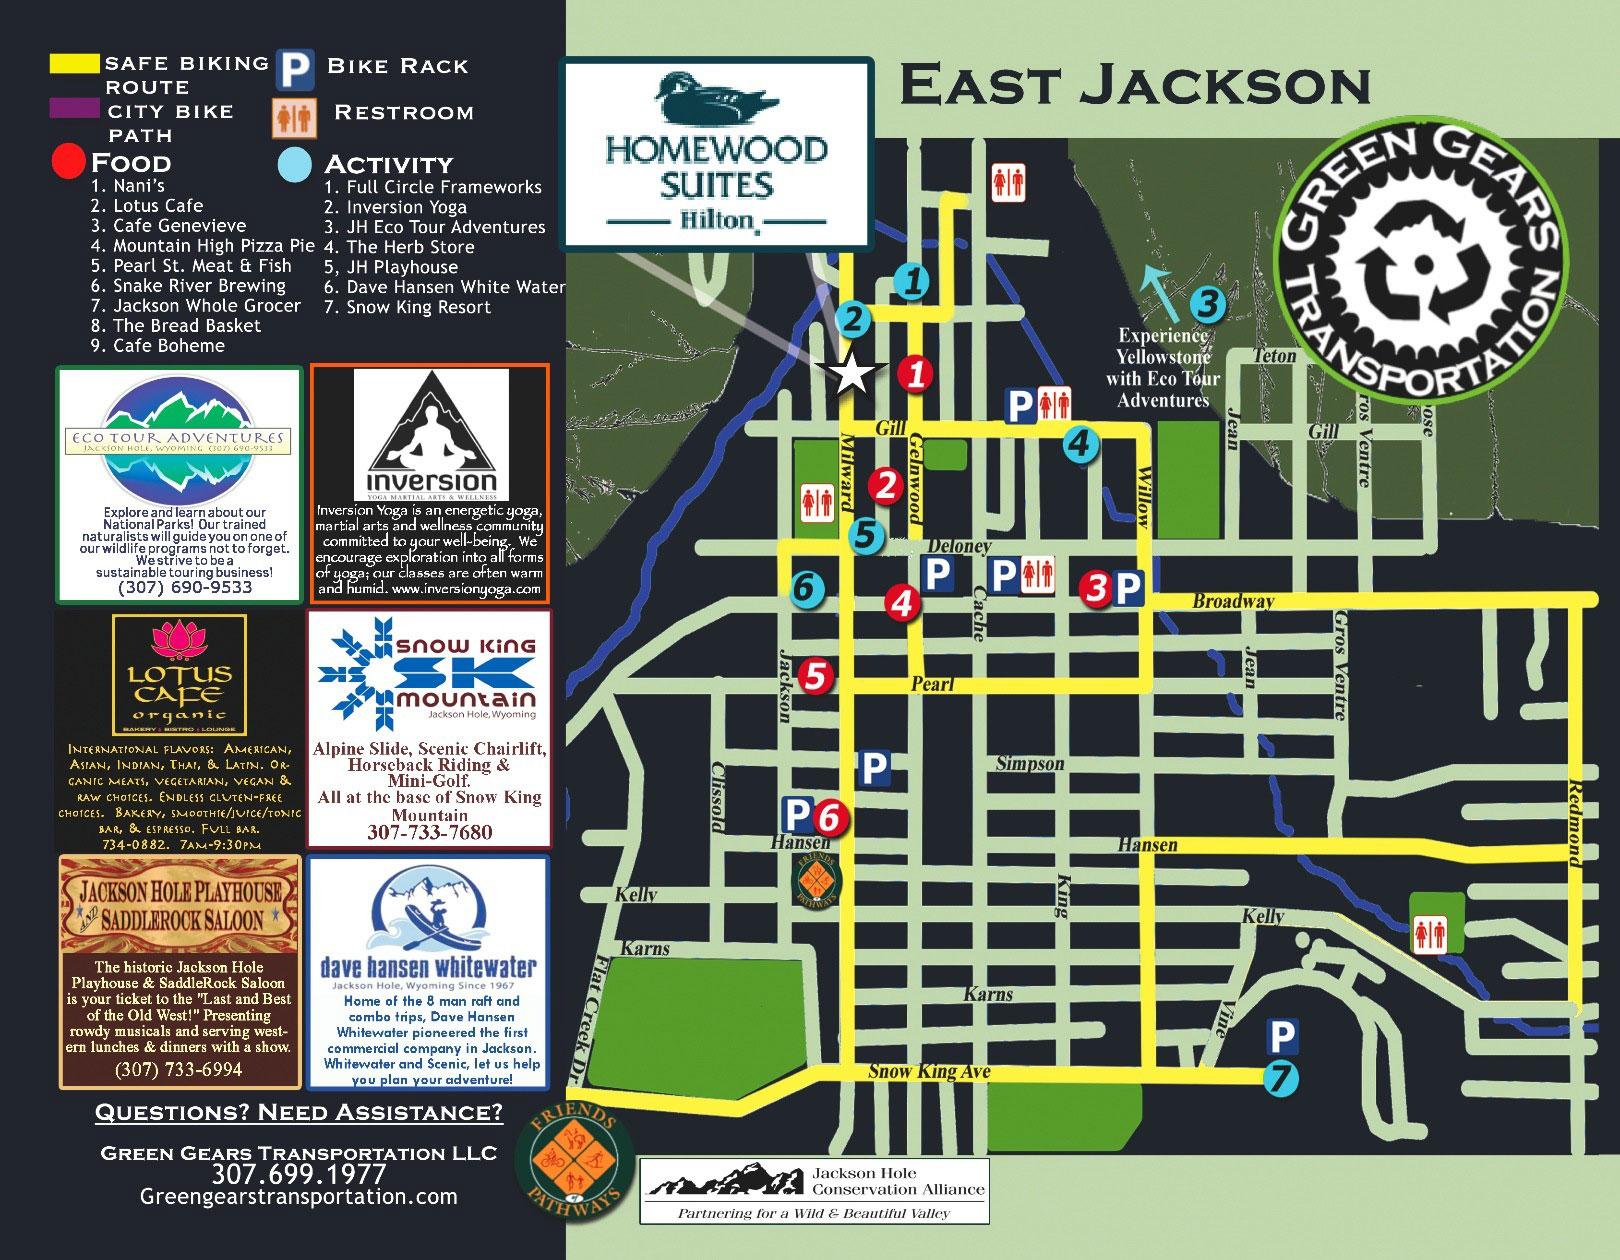 Best Budget Mountain Bike >> Jackson Hole Mountain Biking, Wyoming Bike Rentals & Tours - AllTrips